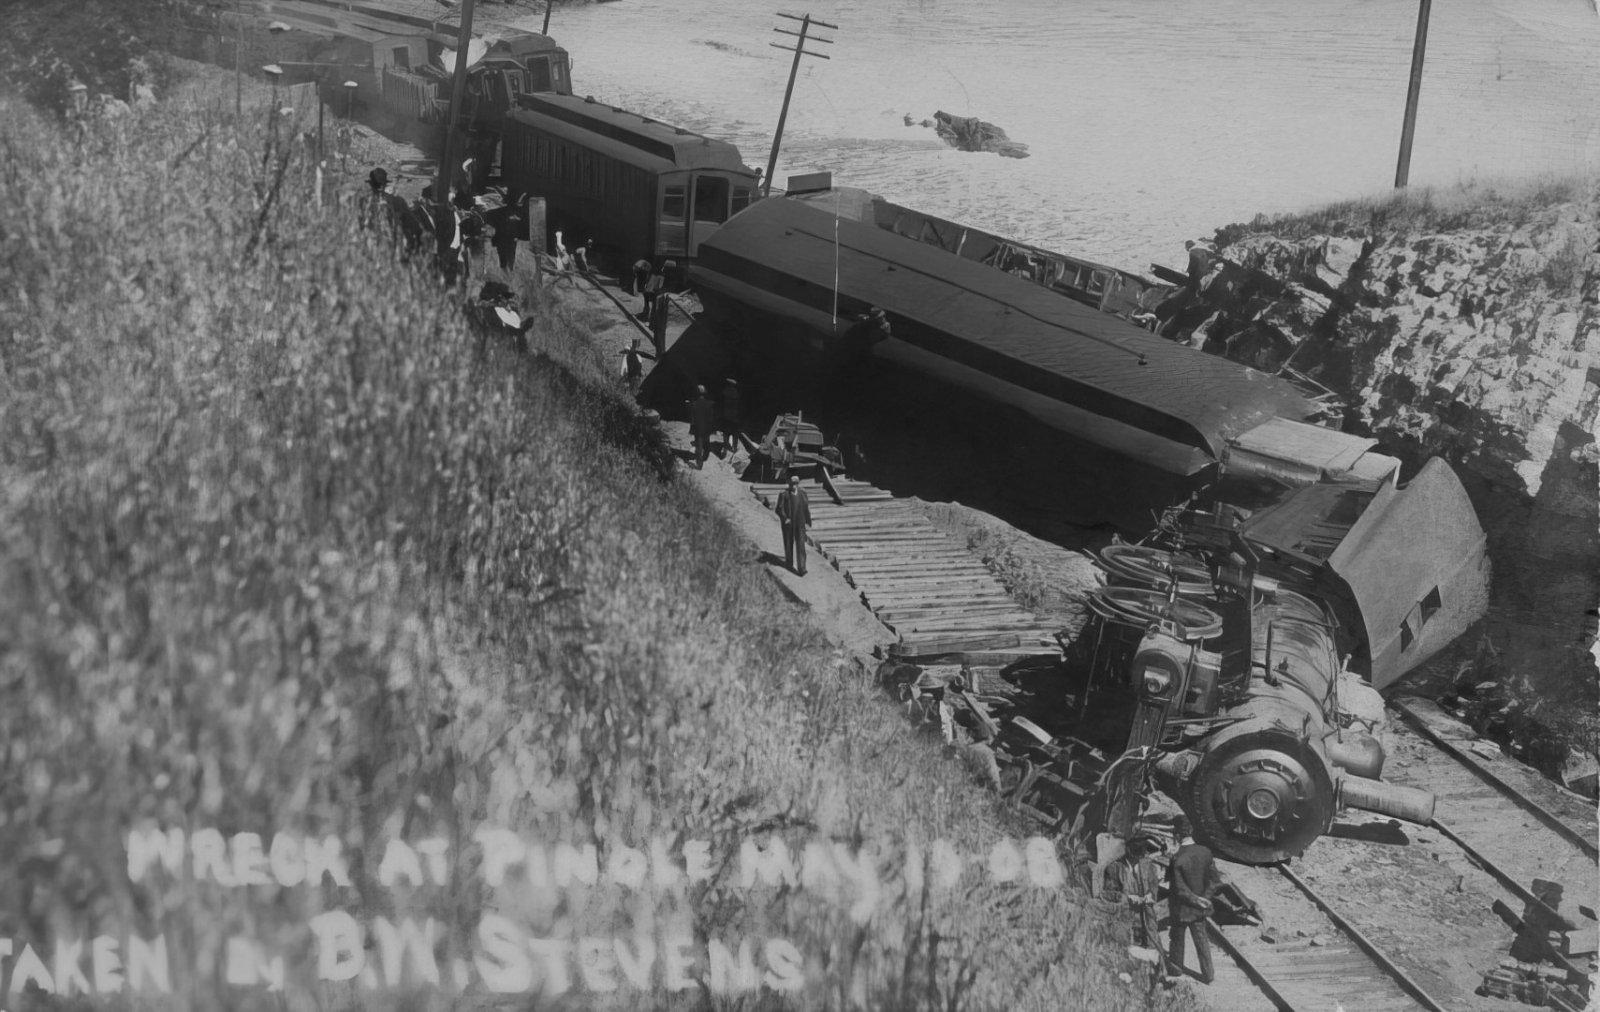 Pinole Train Crash 1908-lowres-scale-4_GRAY (Large).jpg